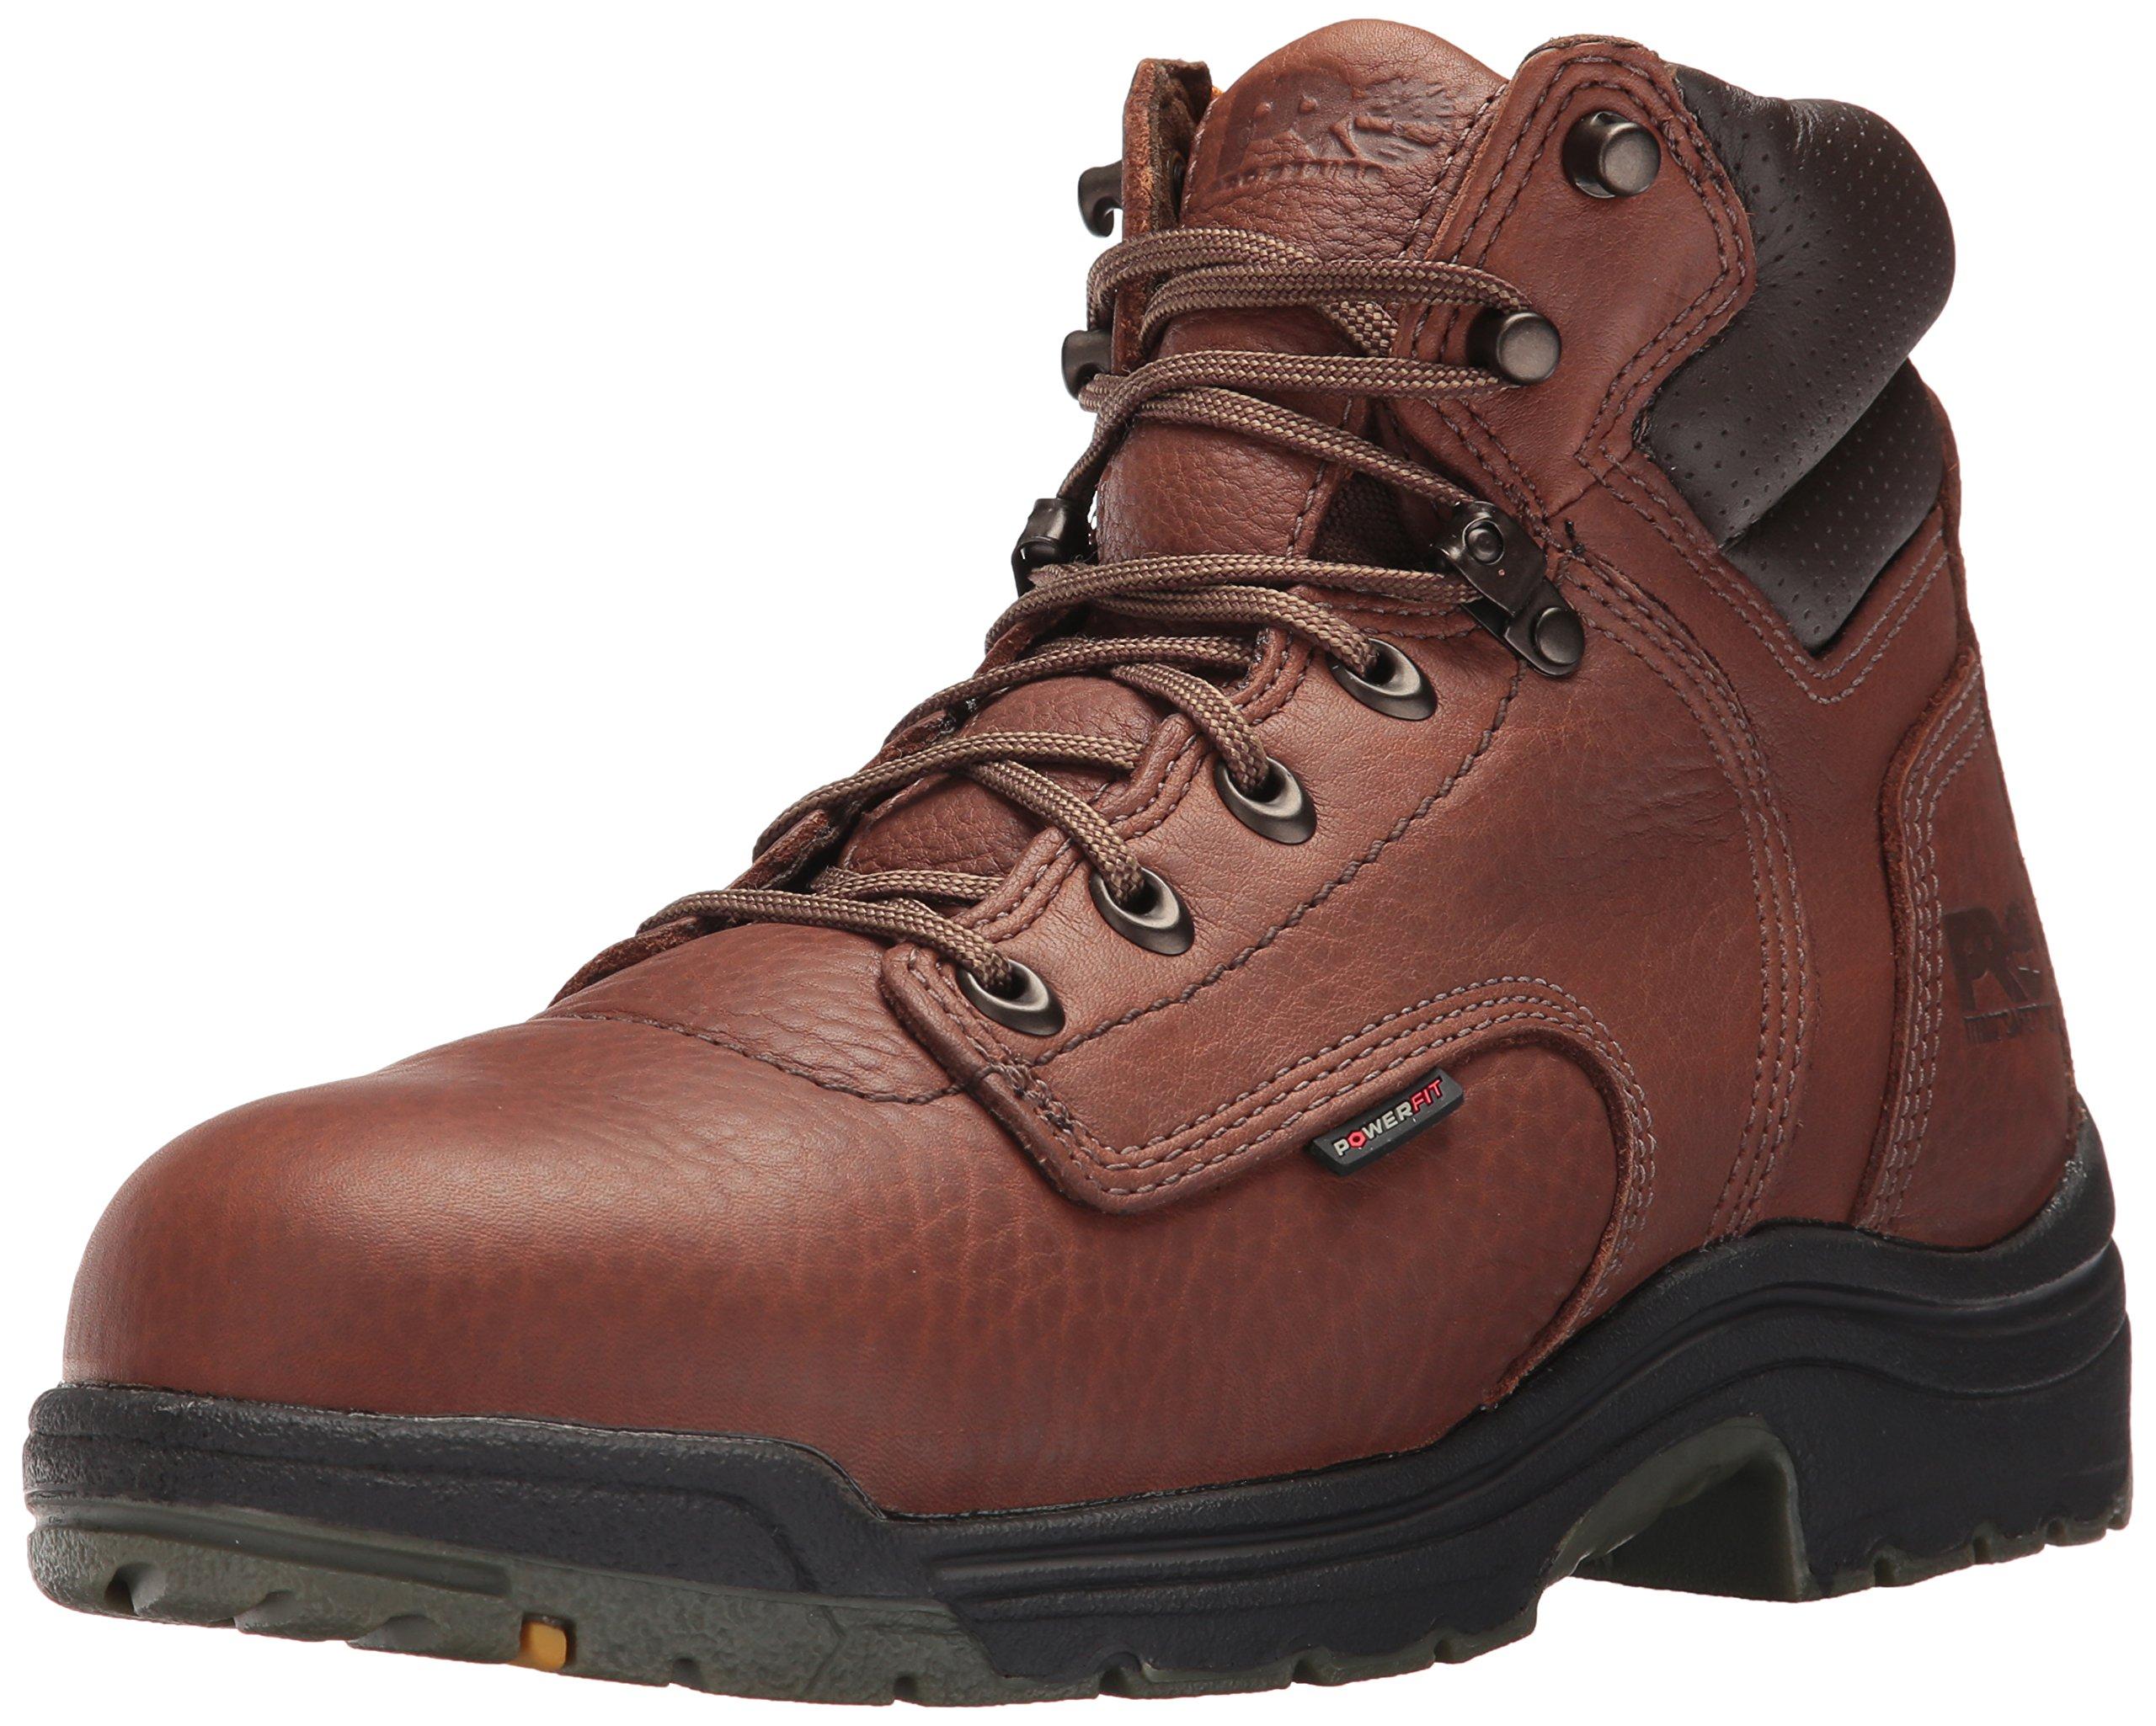 Timberland PRO Men's Titan 6'' Safety Toe Work Boot,Brown/Brown,10.5 M